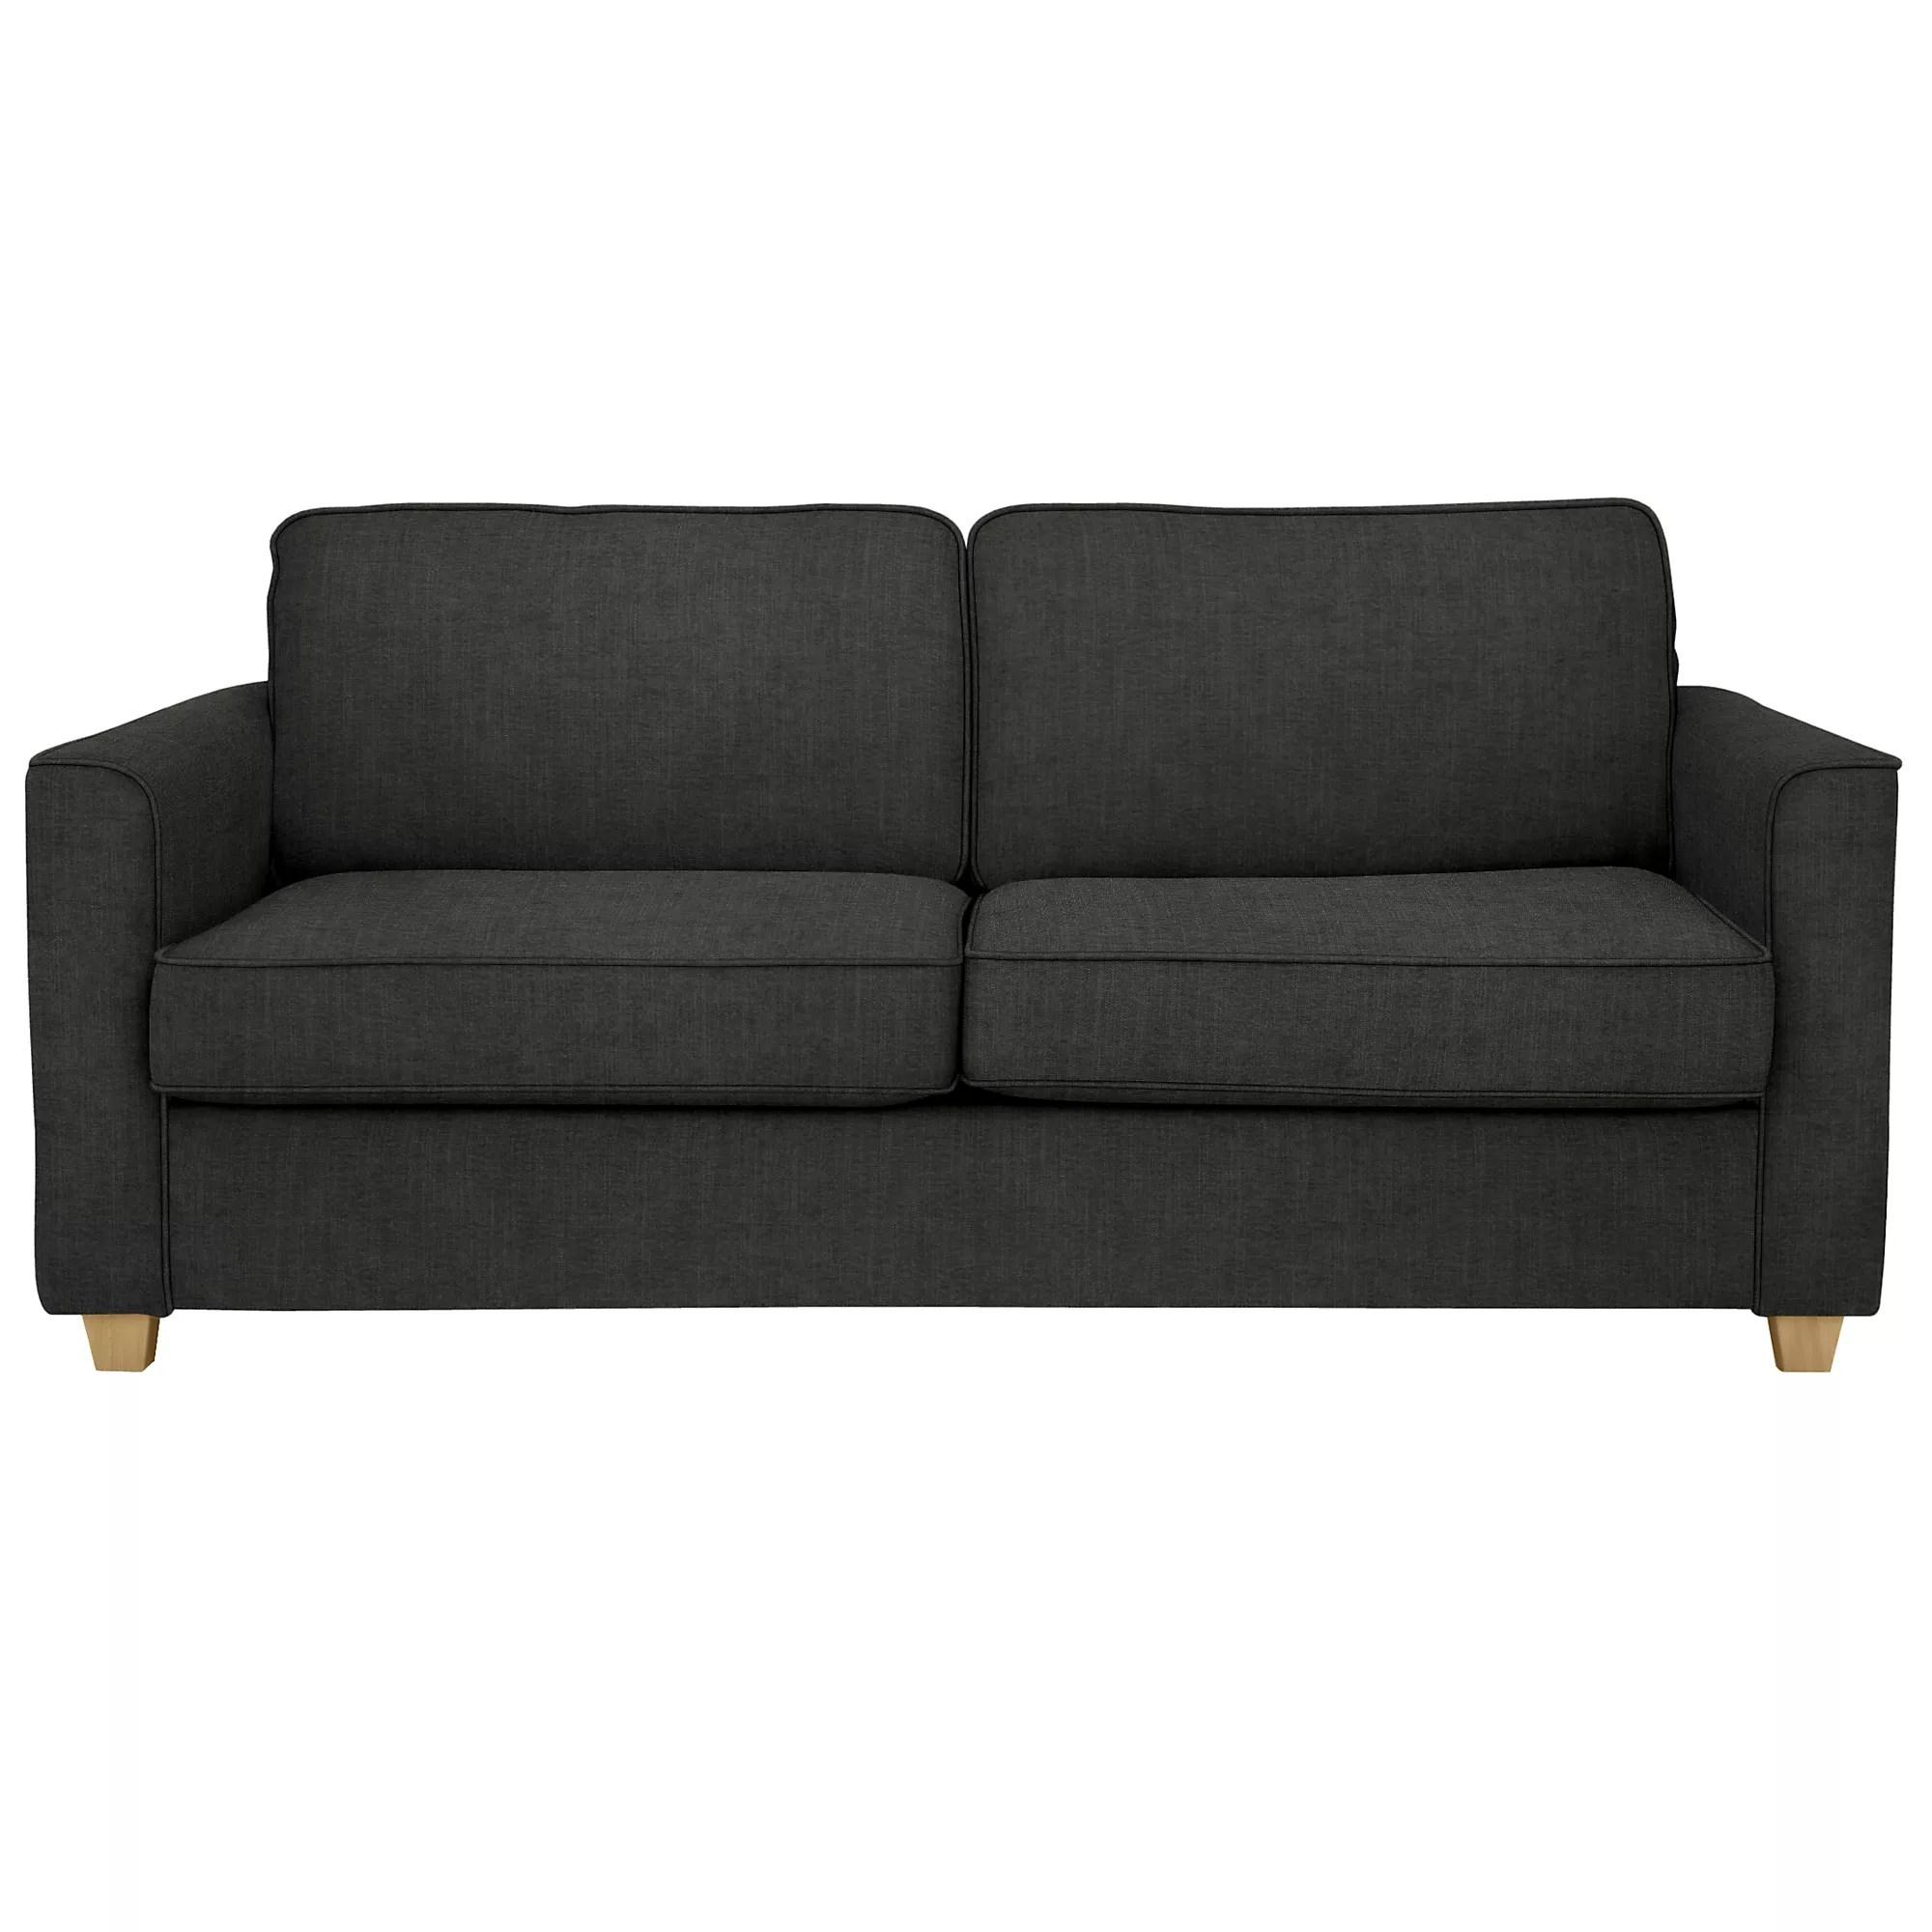 medium sofa bed corner john lewis portia senna charcoal at